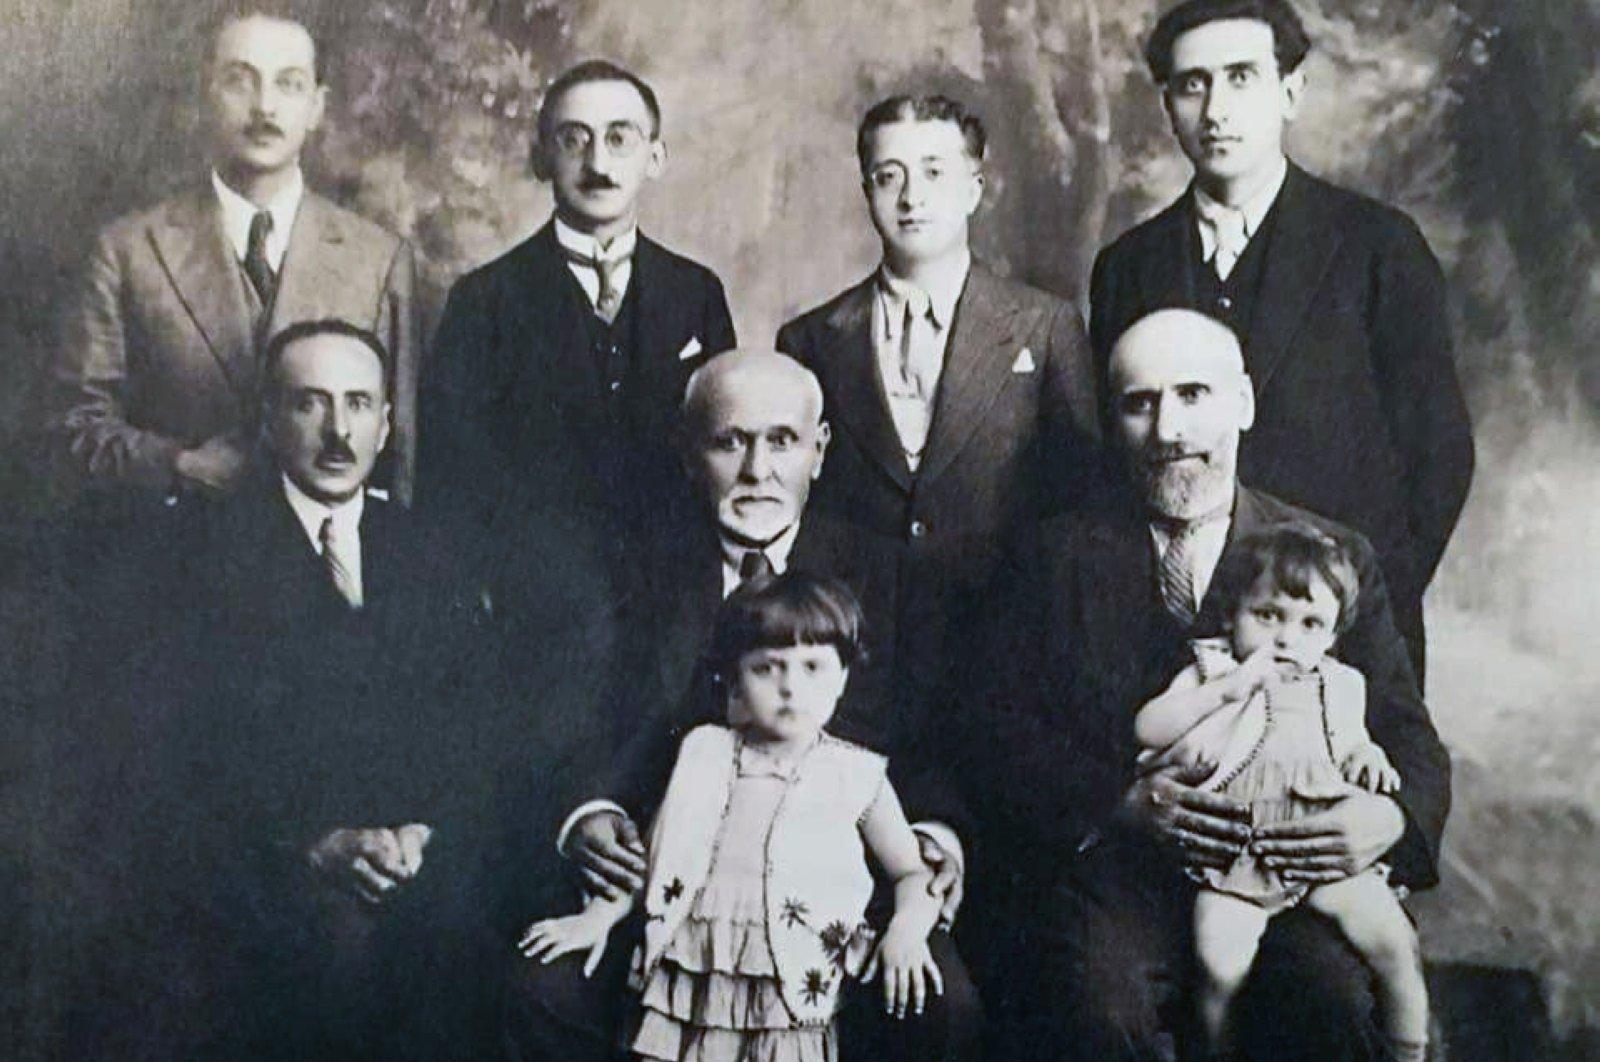 Standing from left to right, Mahir İz, Ali Nihat Tarlan, Abdülbaki Gölpınarlı, Şeyh Sadettin Nüzhet Ergün and sitting from left to right, Abdülbaki Baykara, Ömer Ferid Kam and Tahir Olgun.